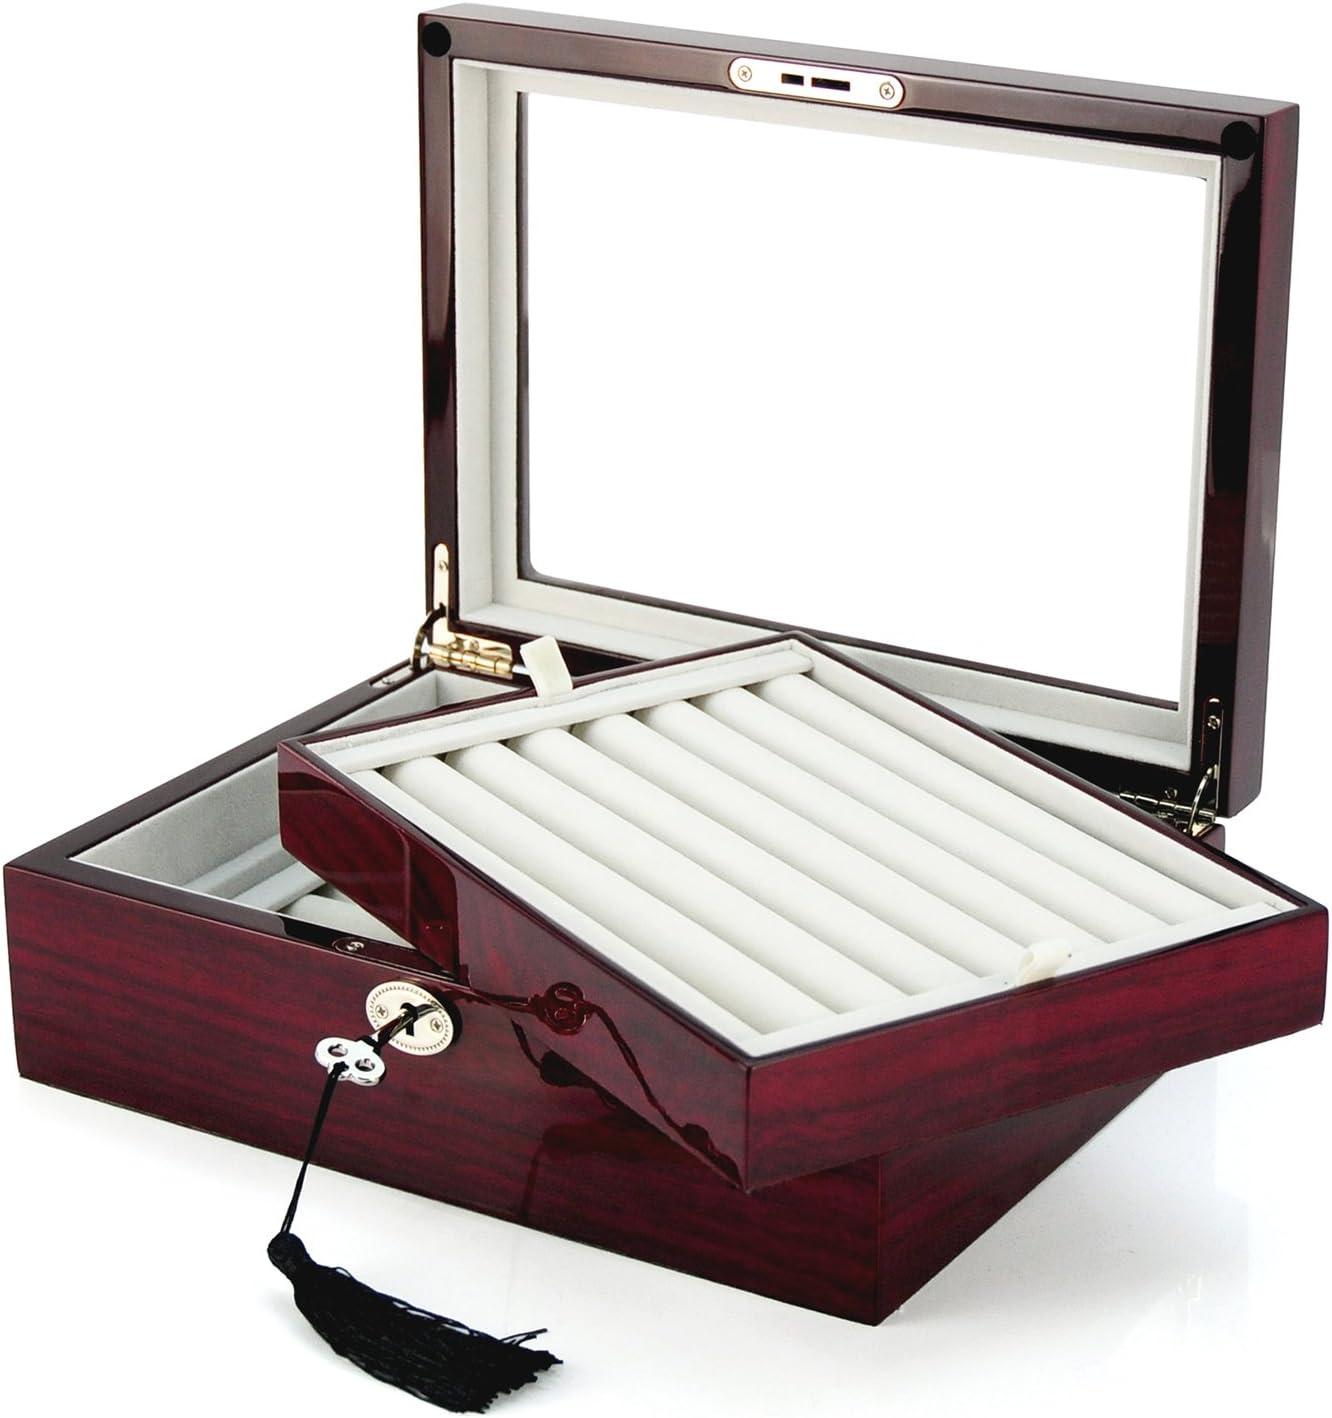 Large Cufflinks Box Storage Case Mahogany Double Layer Cufflinks Lapel Pins Ring Holder Jewelry Display Organizer